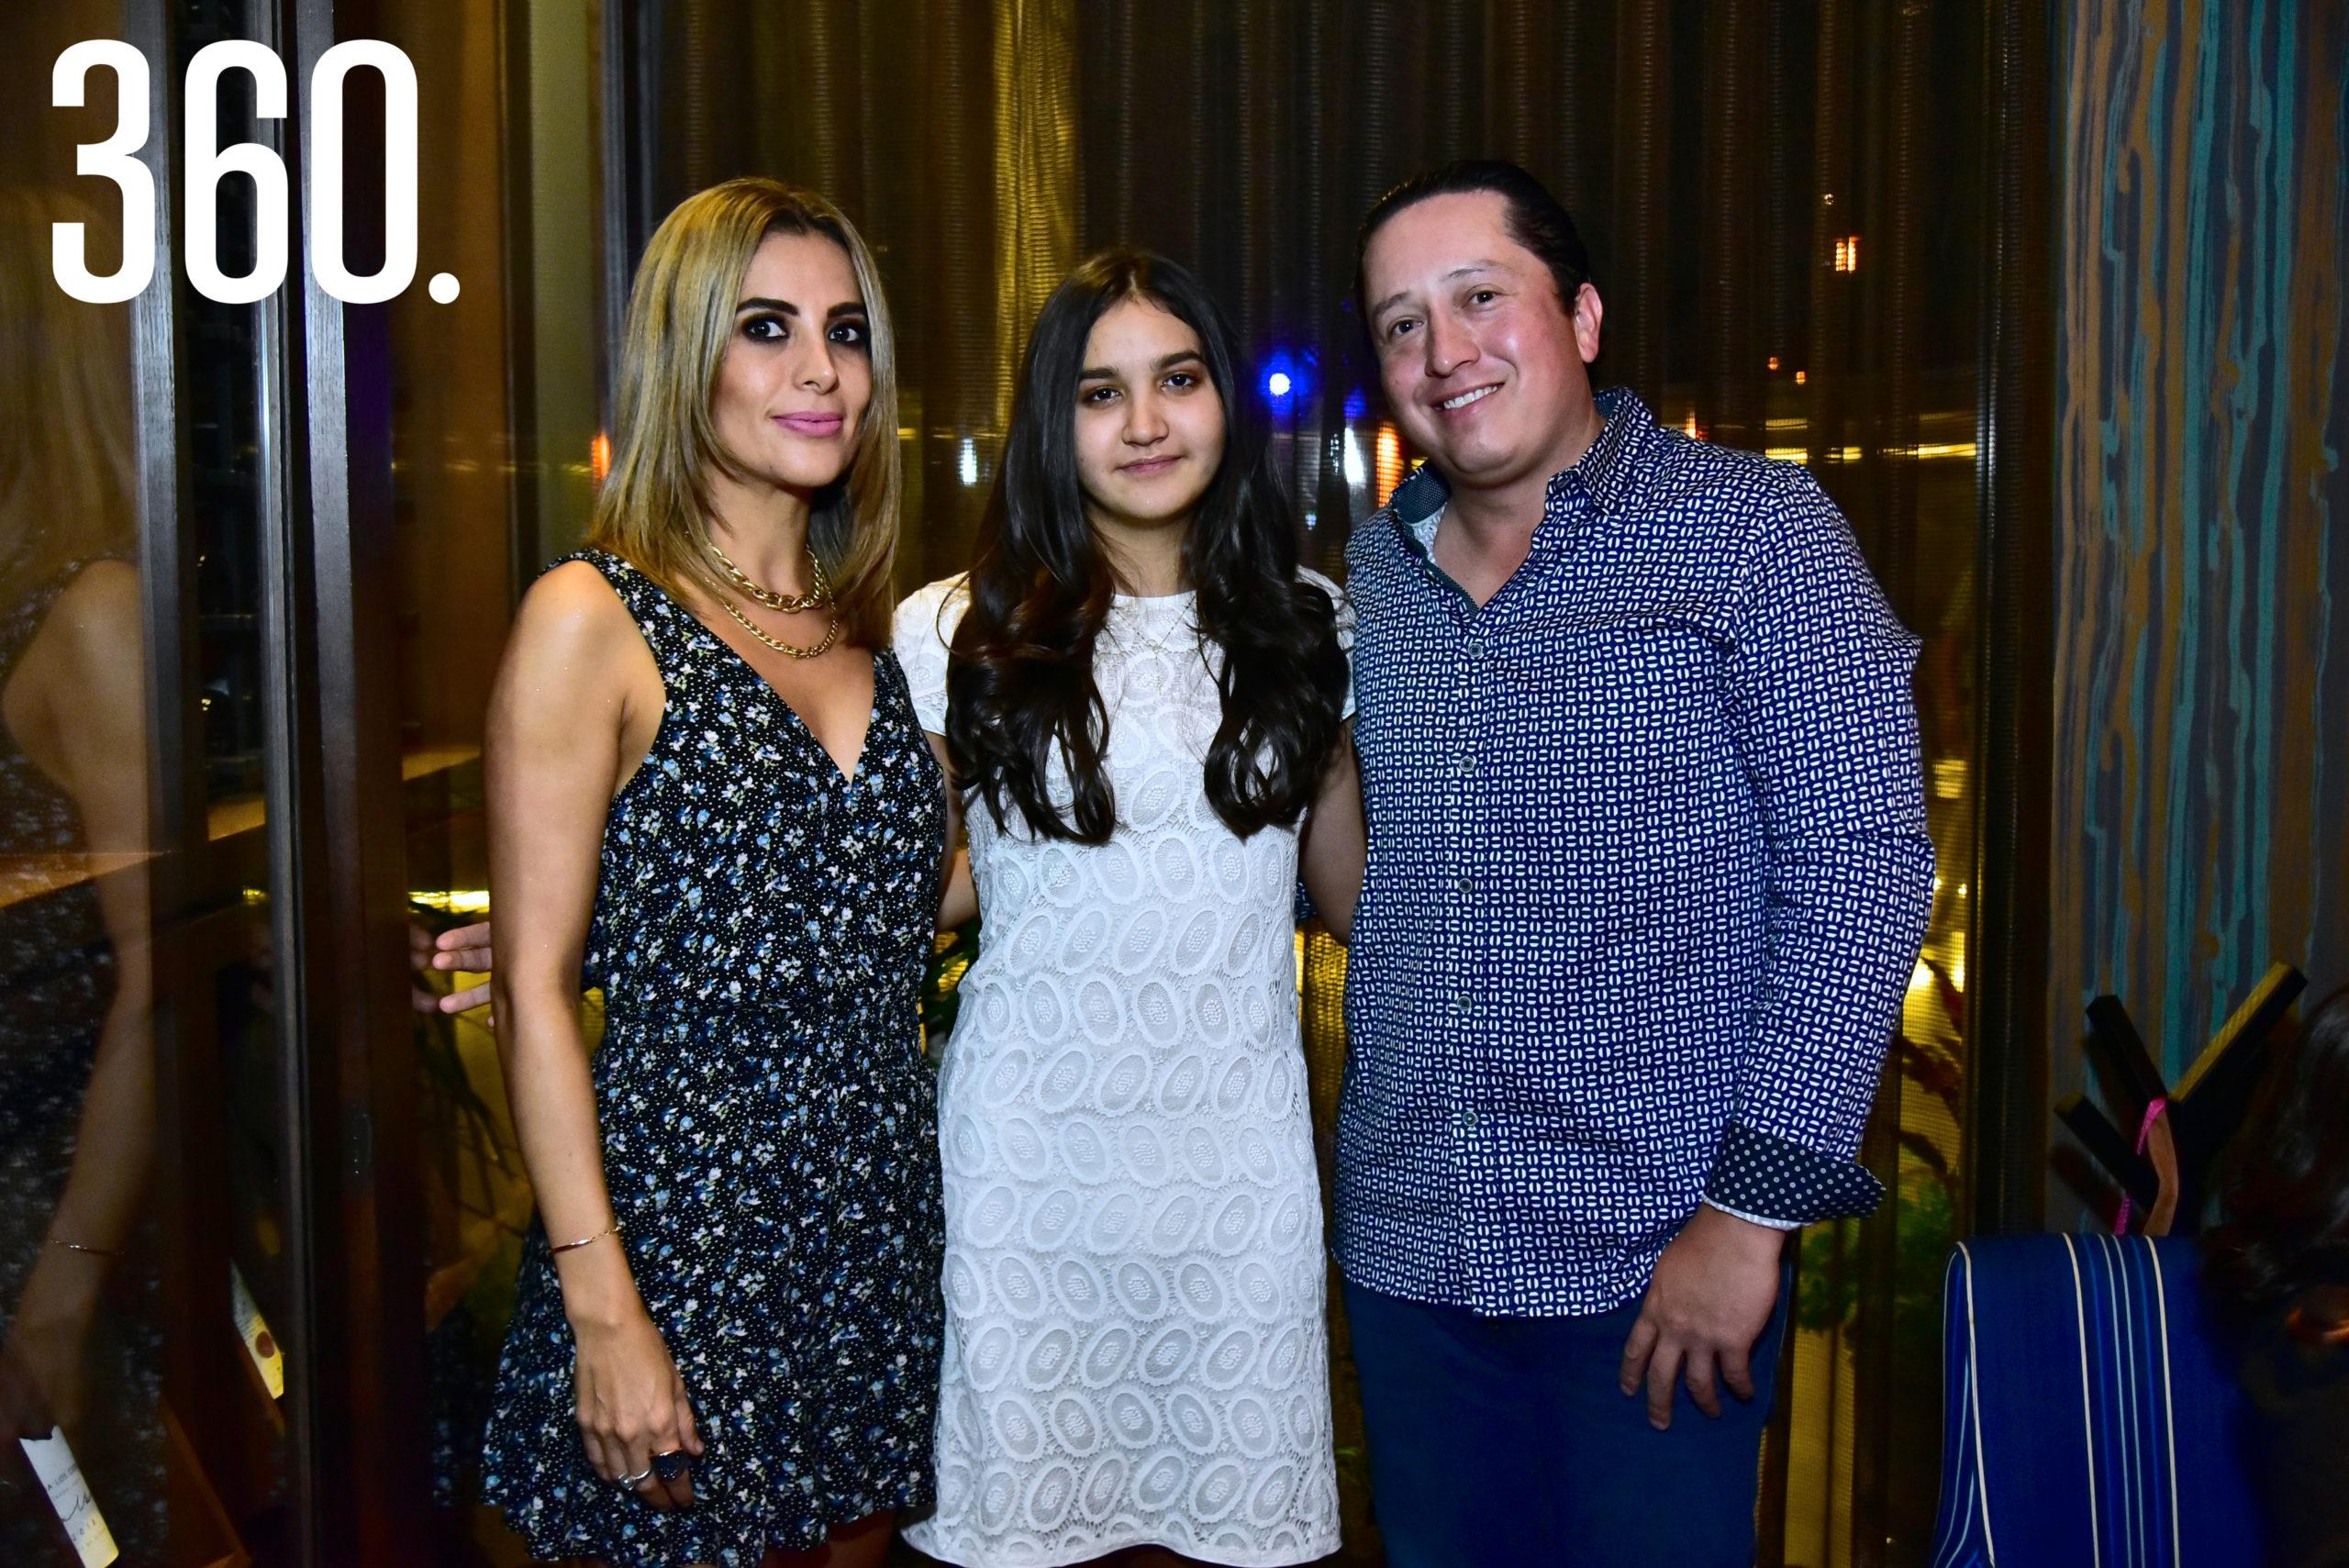 Gaby Sánchez, Bárbara Bichara Sánchez y Emilio Bichara.